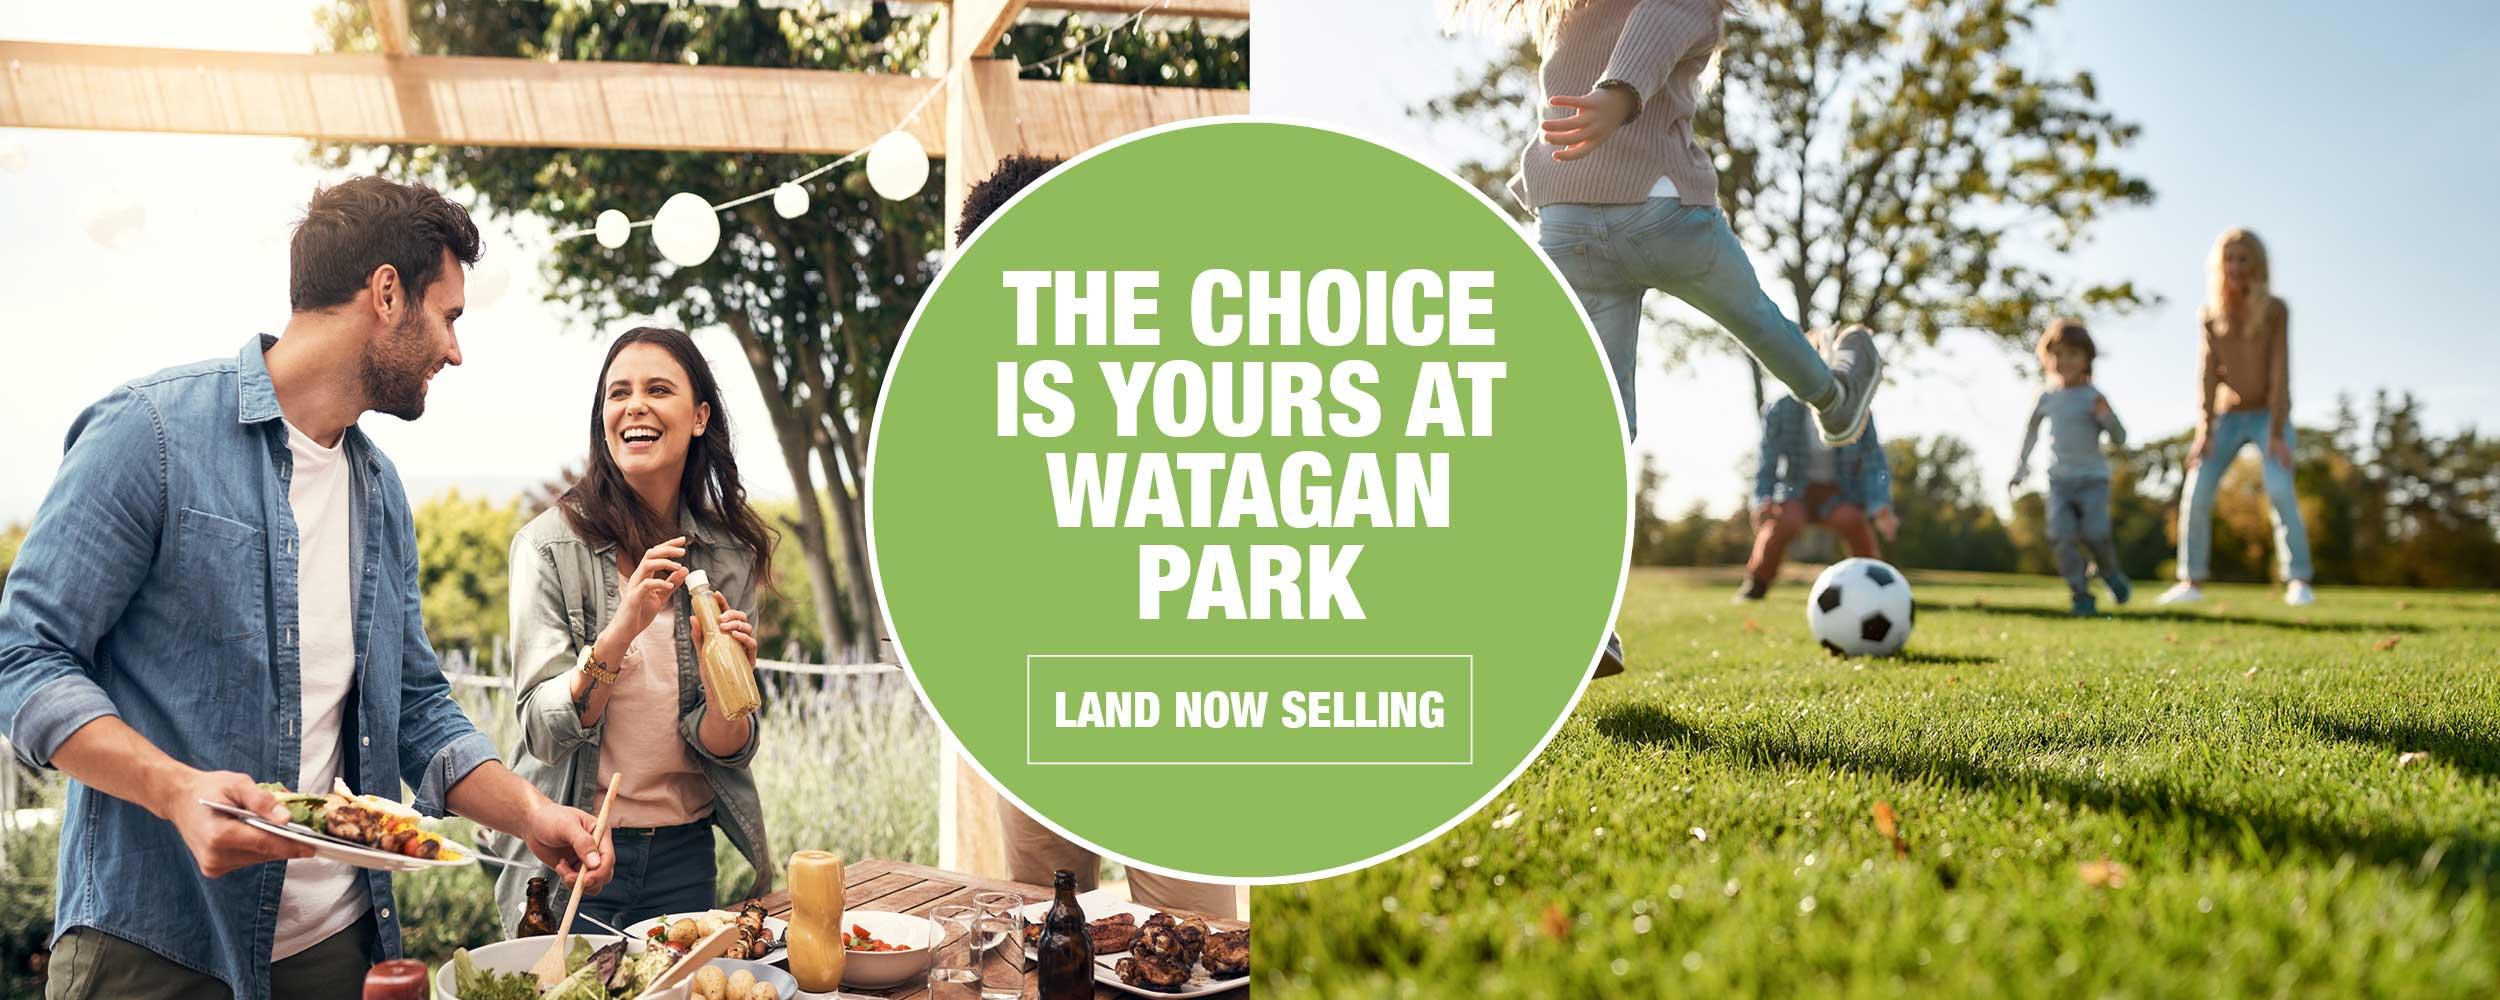 watagan park outdoor lifestyle